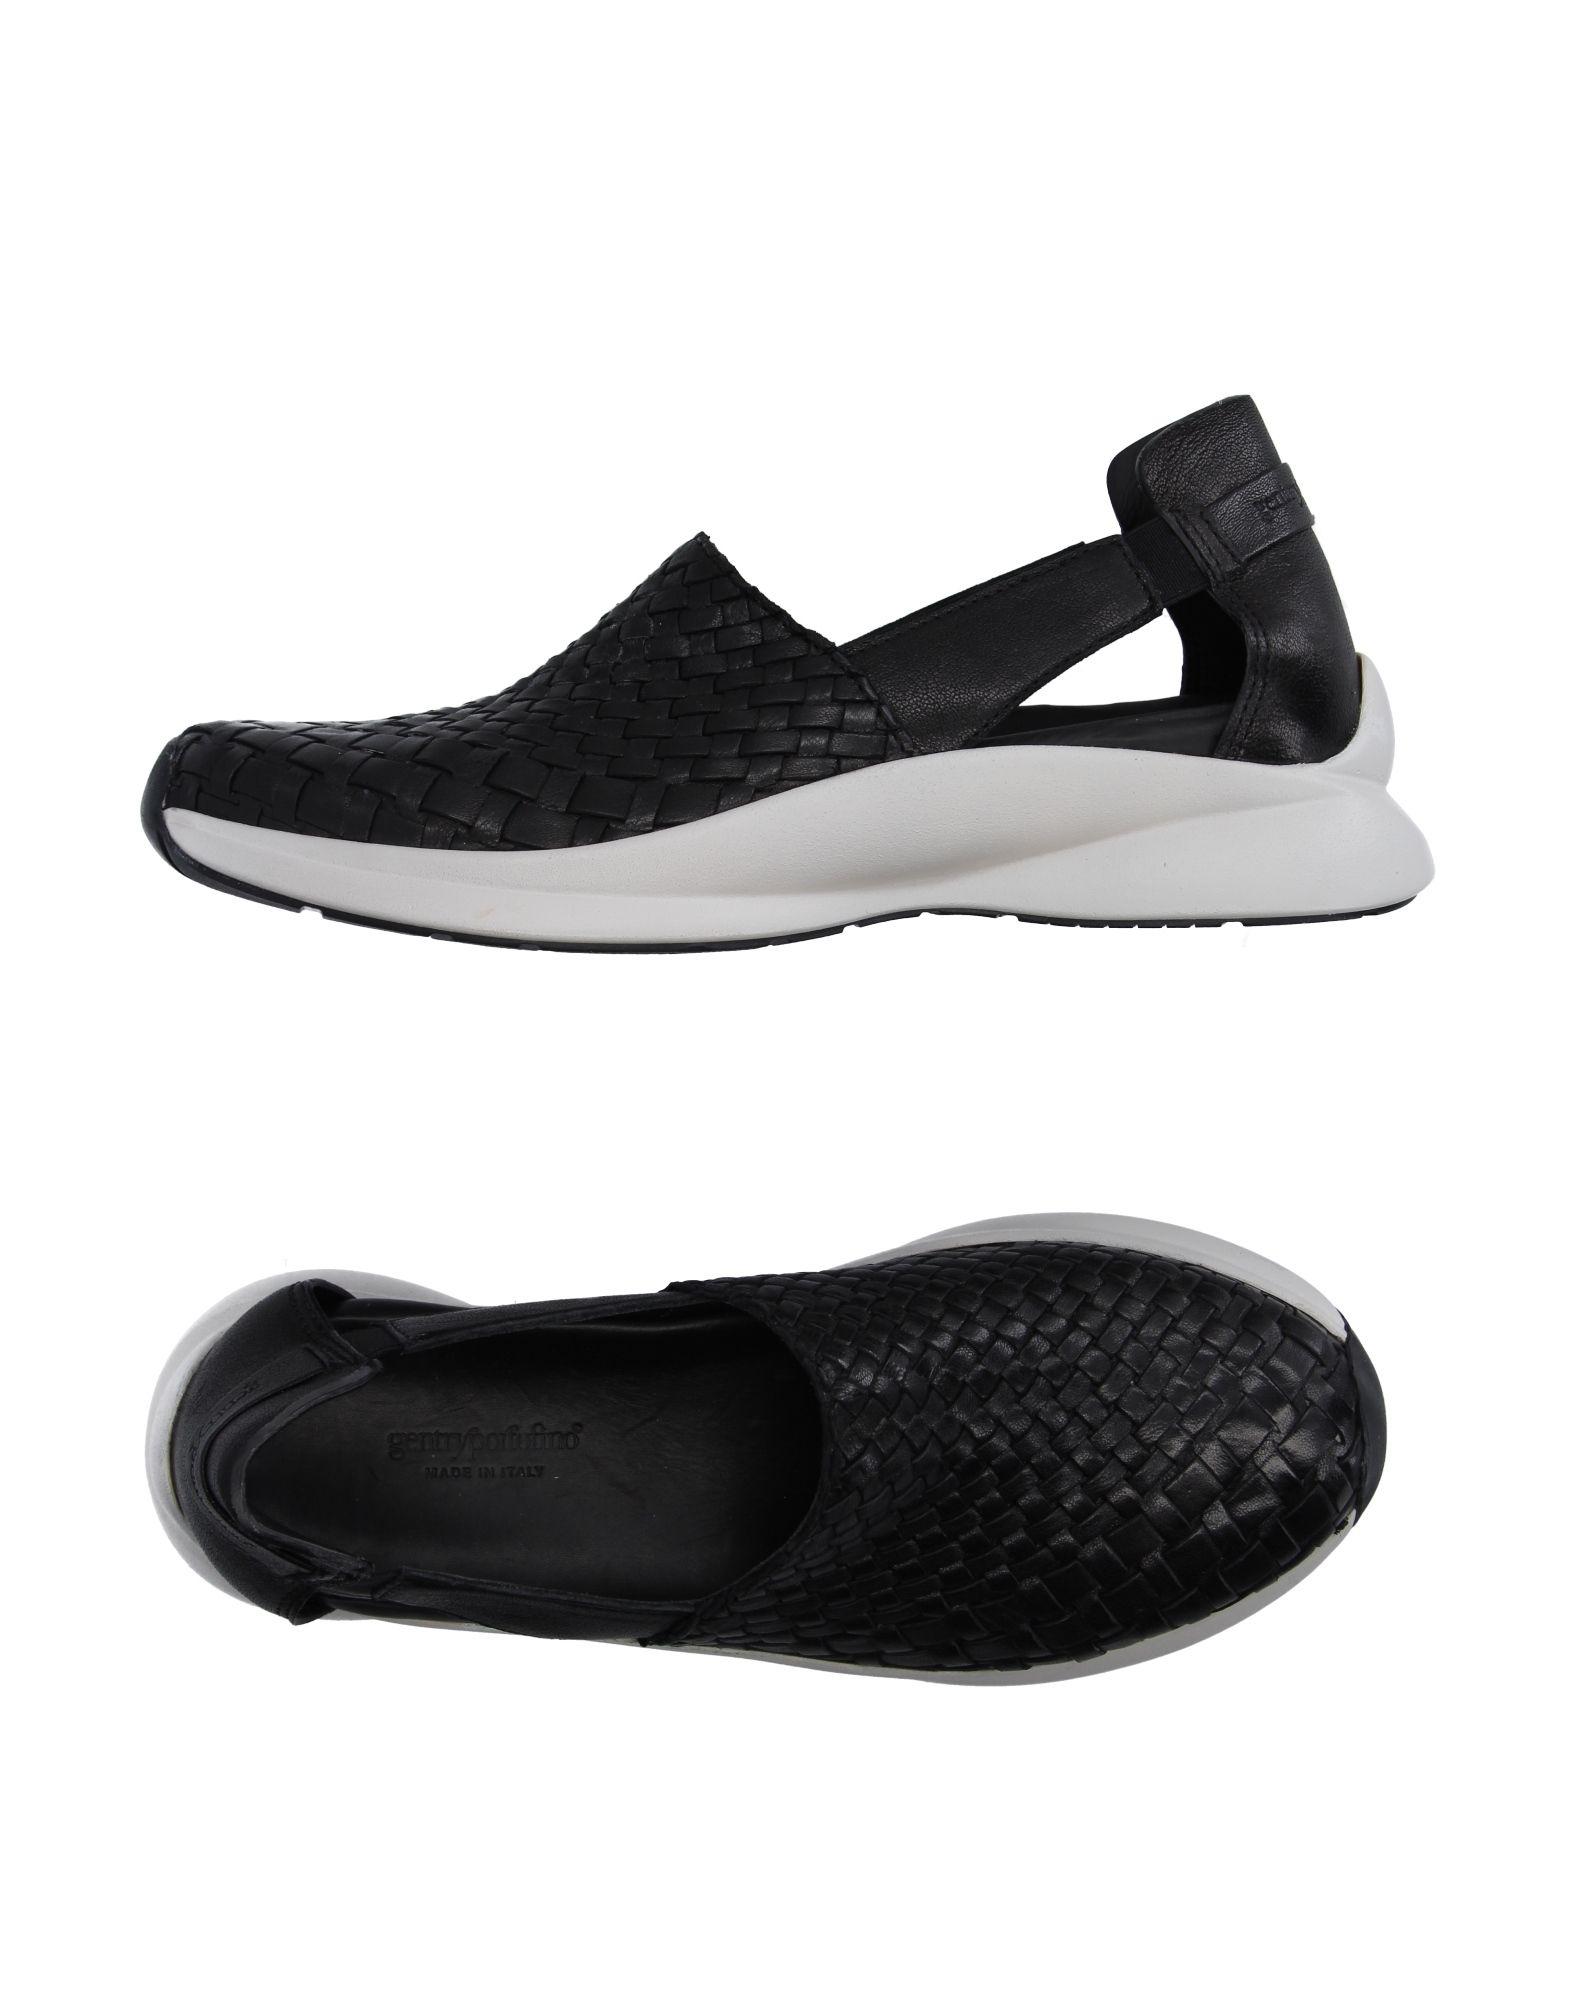 Gentryportofino Sneakers Damen  11161743UW Gute Qualität beliebte Schuhe